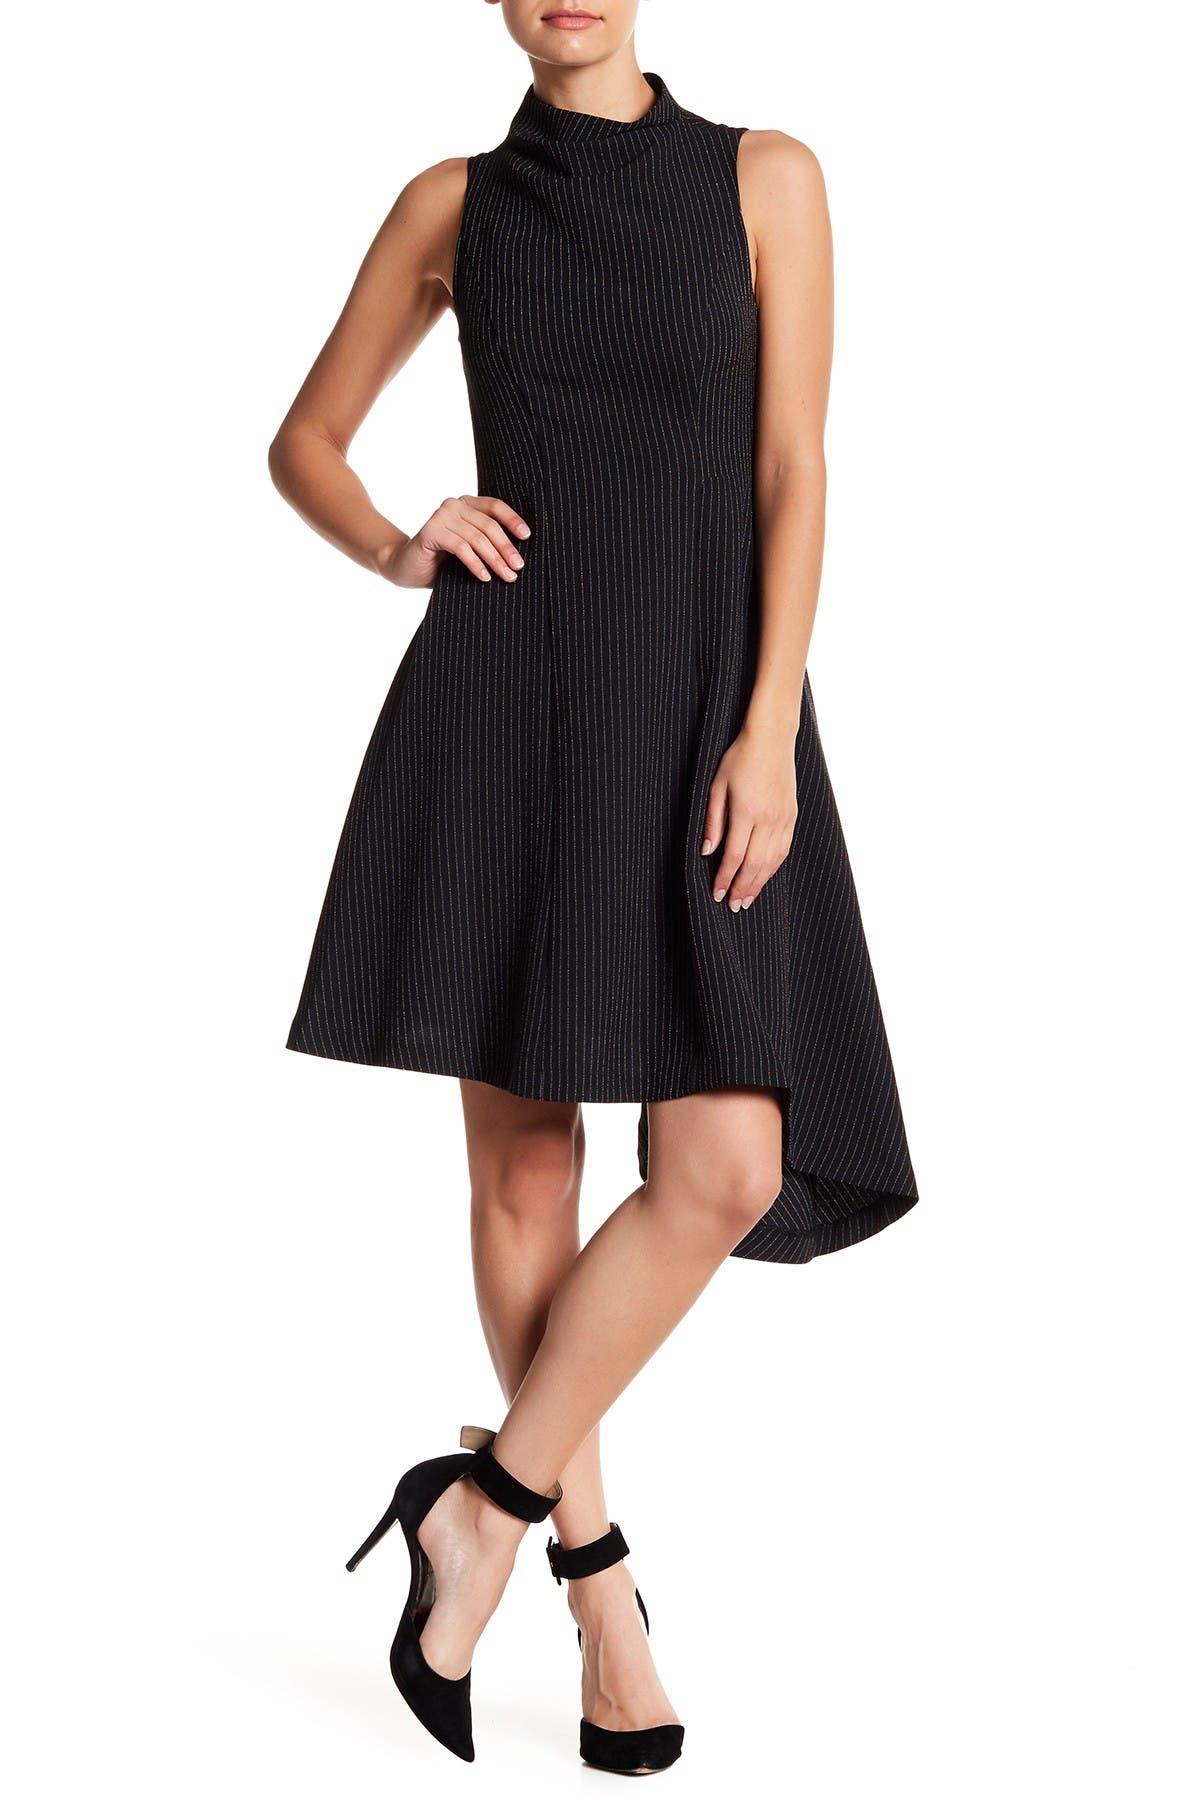 Image of Betsey Johnson Sleeveless Striped Dress